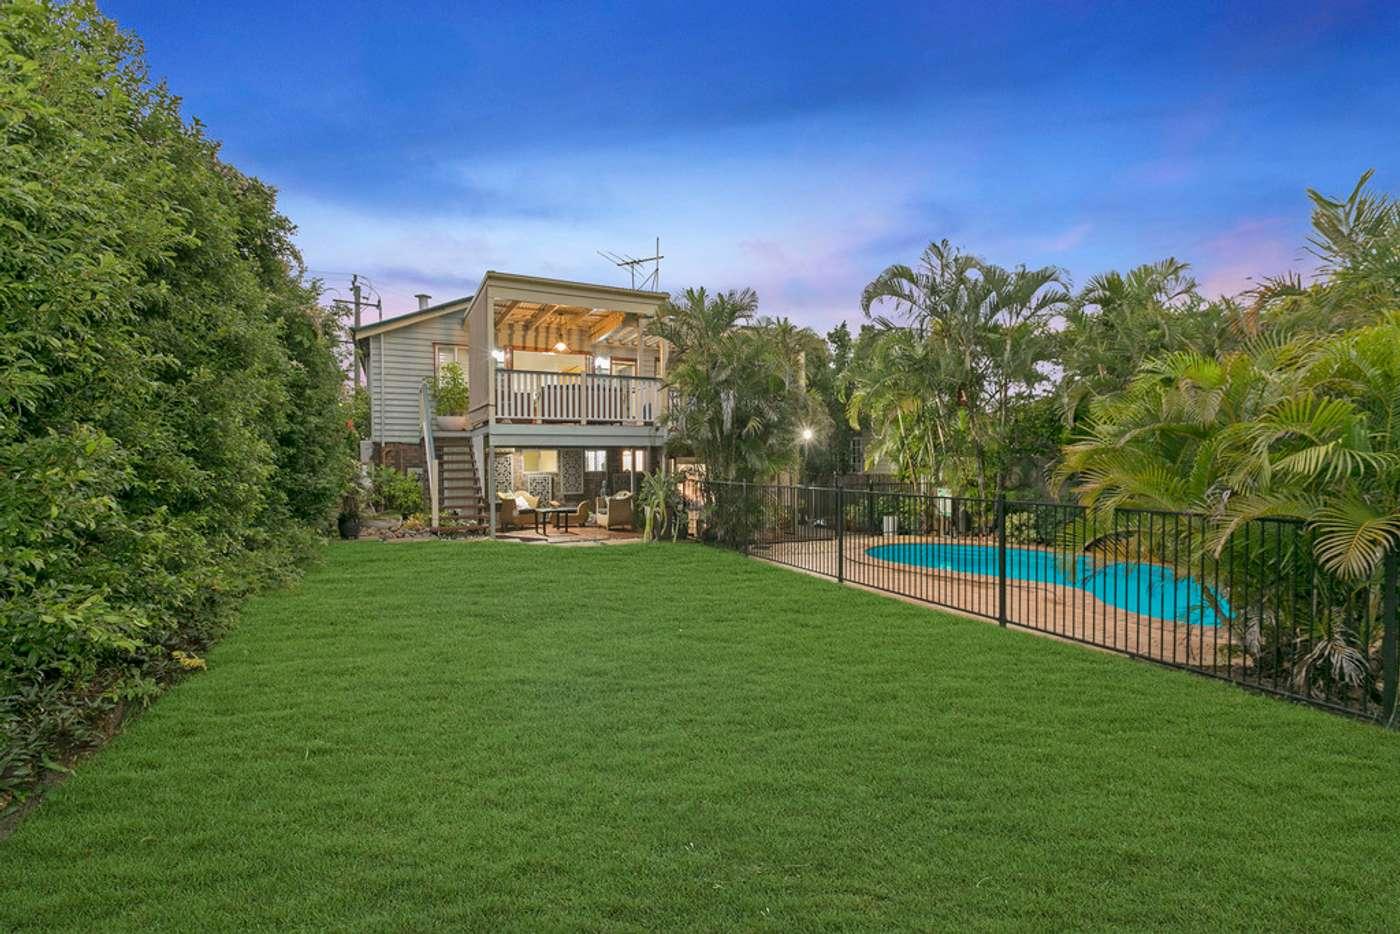 Main view of Homely house listing, 18 Windsor Street, Nundah QLD 4012